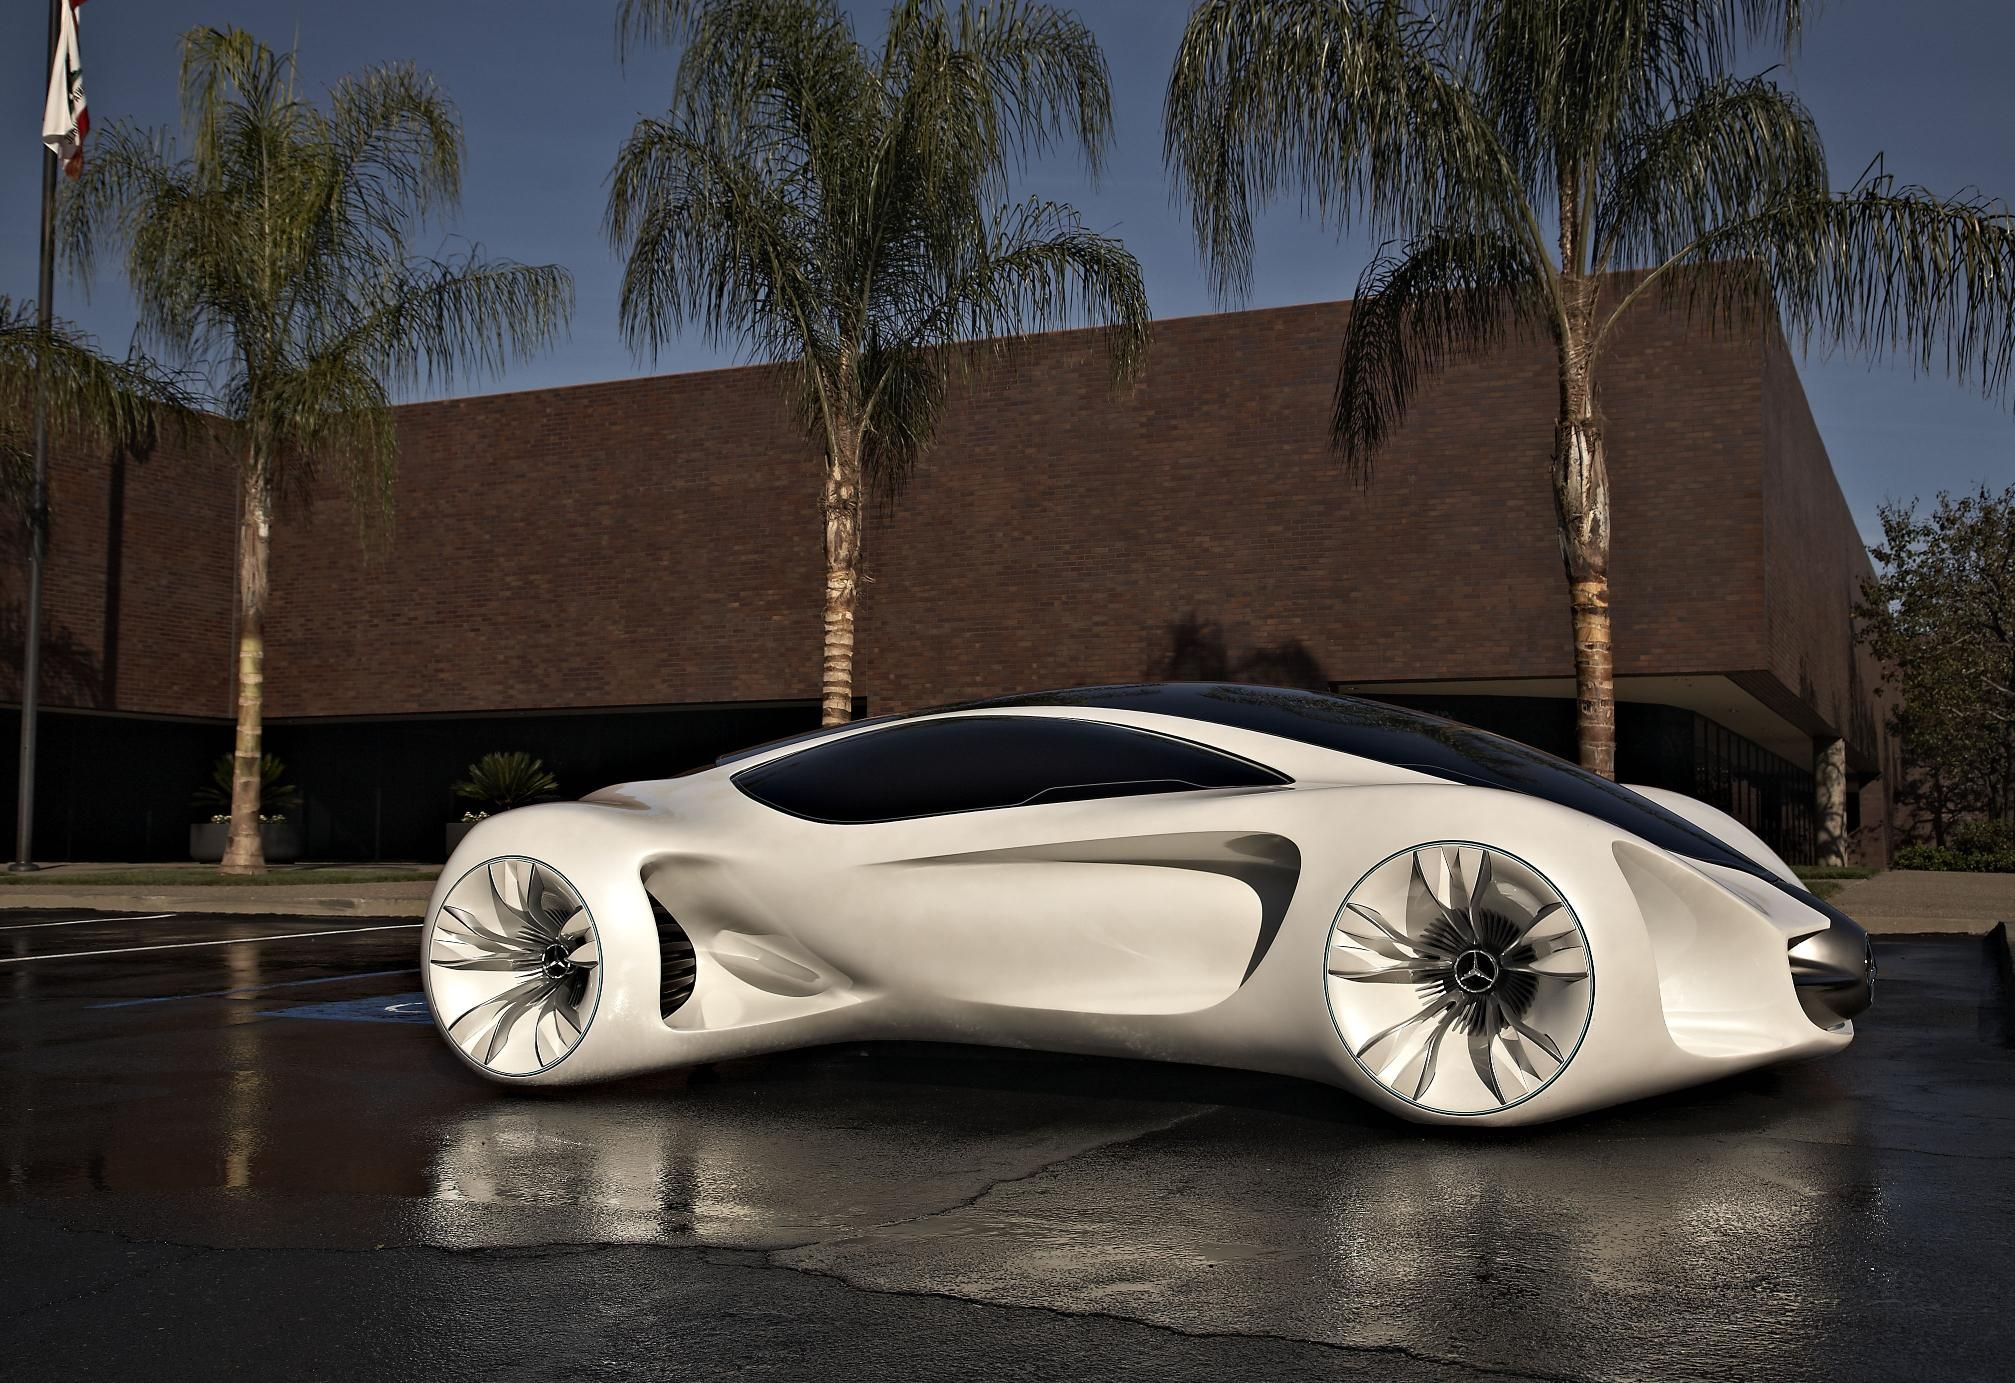 Mercedes Benz Biome Concept Super Voiture Voiture Voiture Neuve